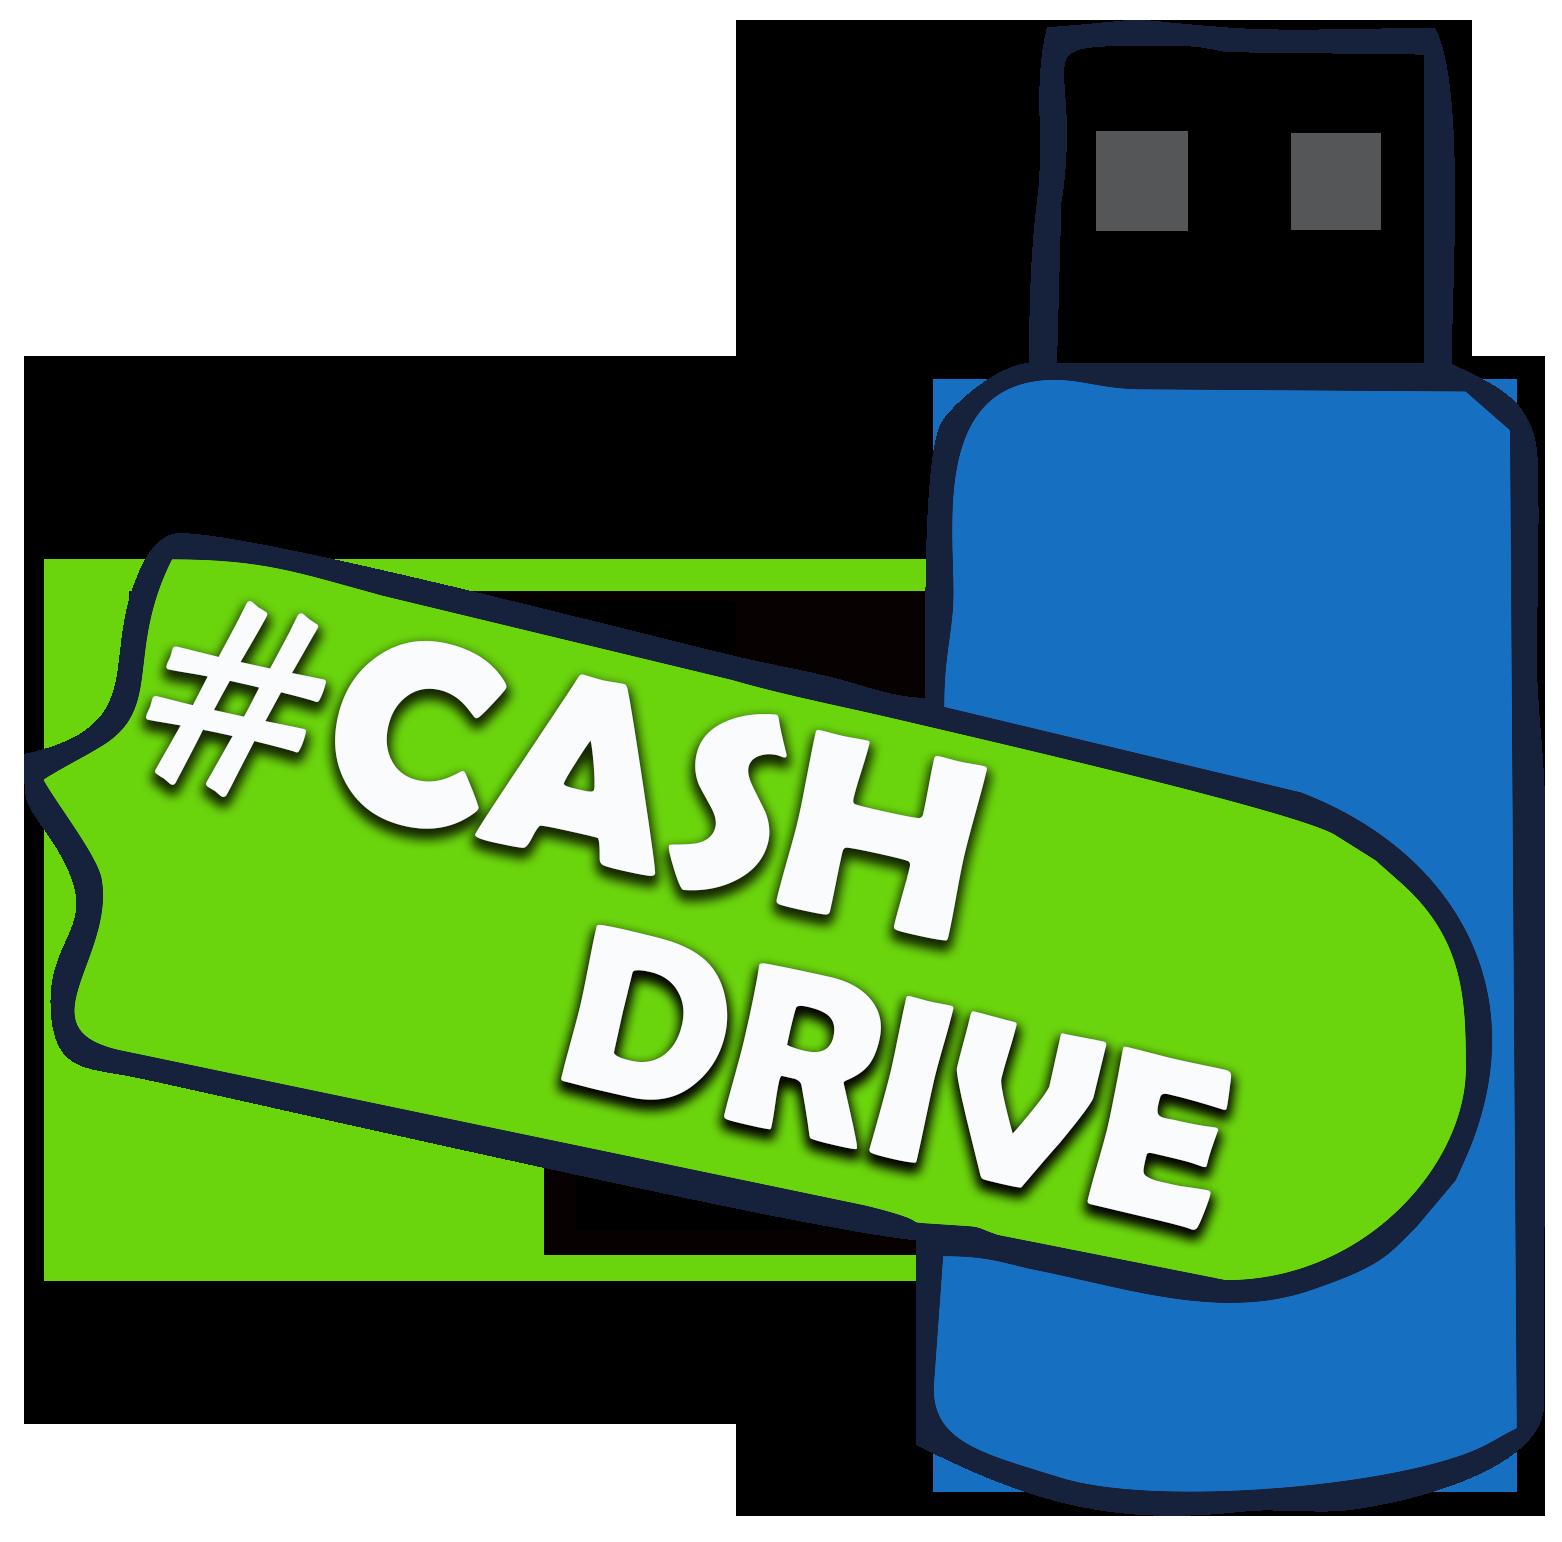 Voucher #Cashdrivecombo - Kits 8 GB para Empresas e Fotógrafos